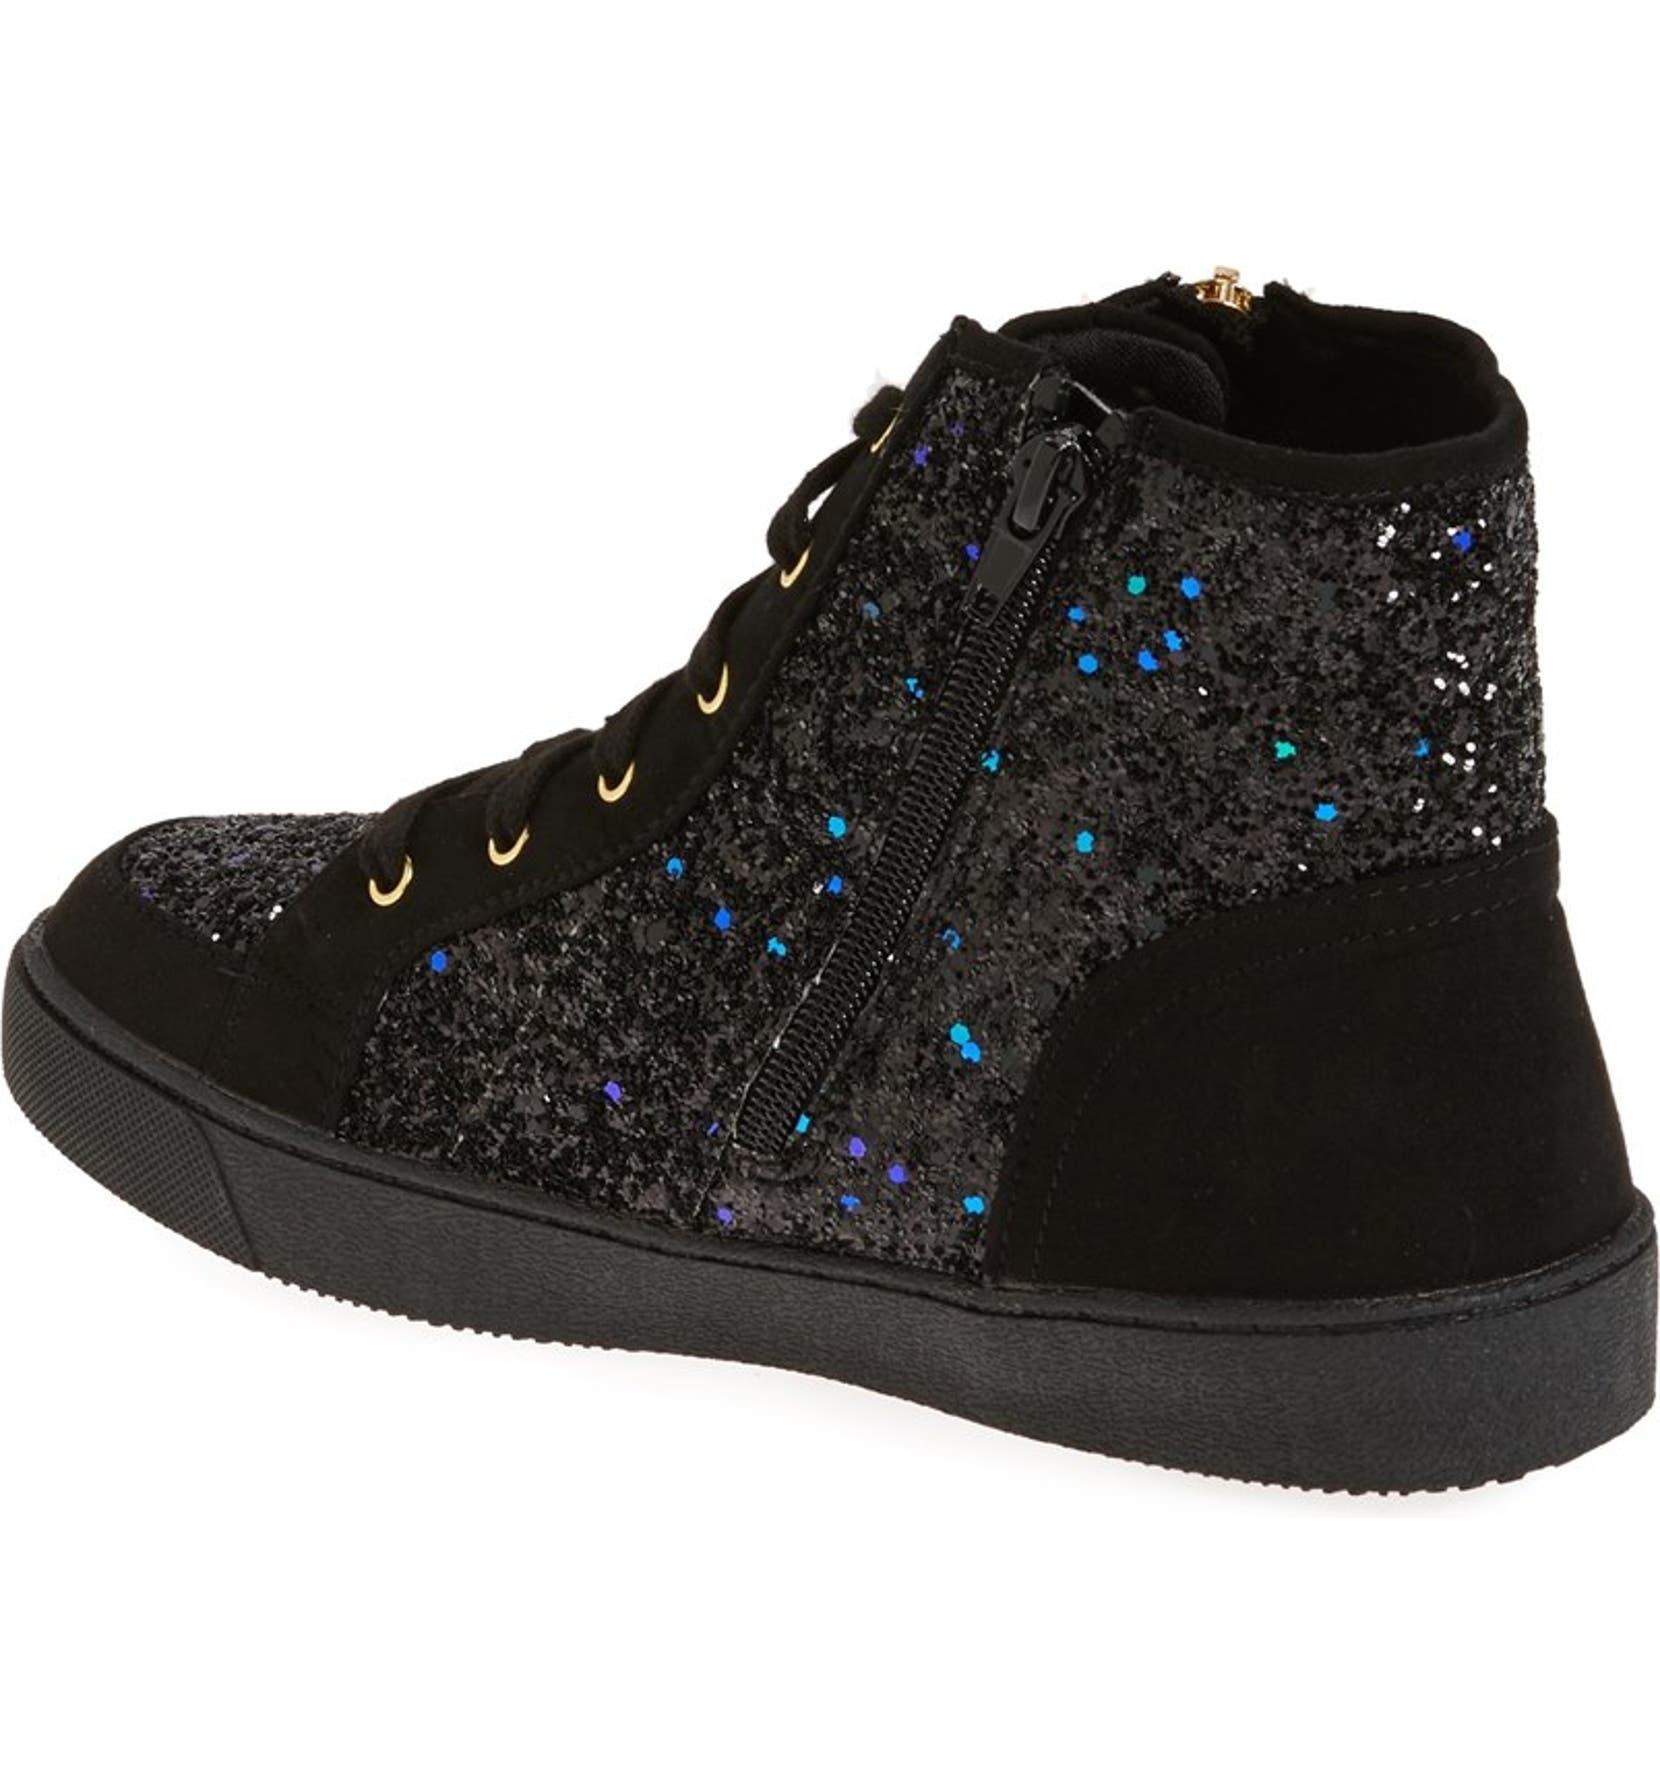 55b7ddada08164 Sam Edelman  Britt Roxy  Glittery High Top Sneaker (Toddler